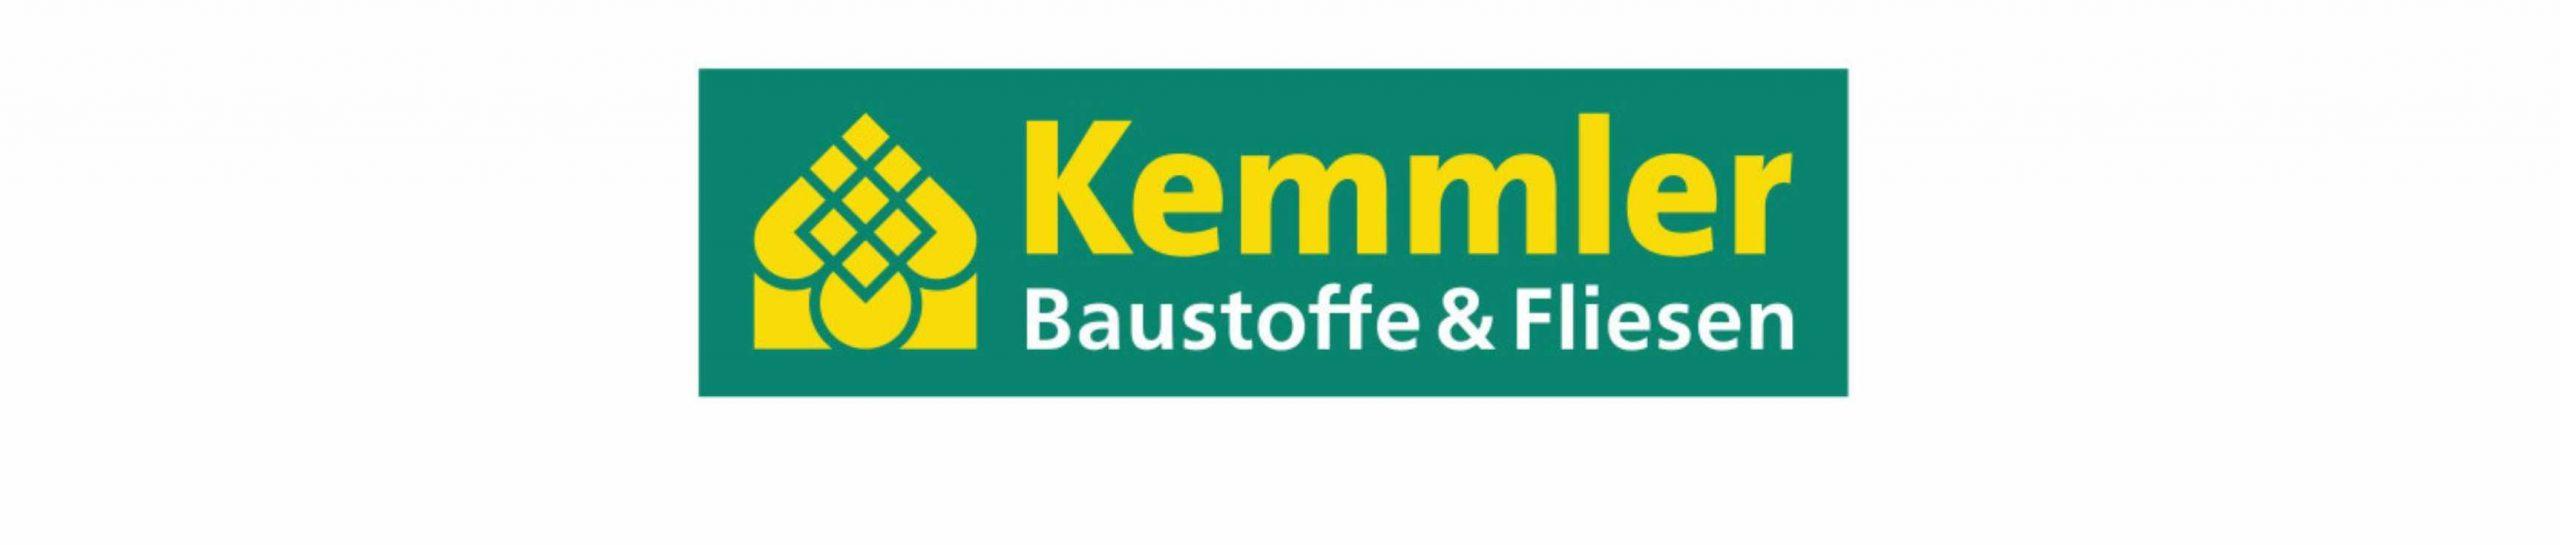 Kemmler Baustoffe München GmbH - Unterhaching